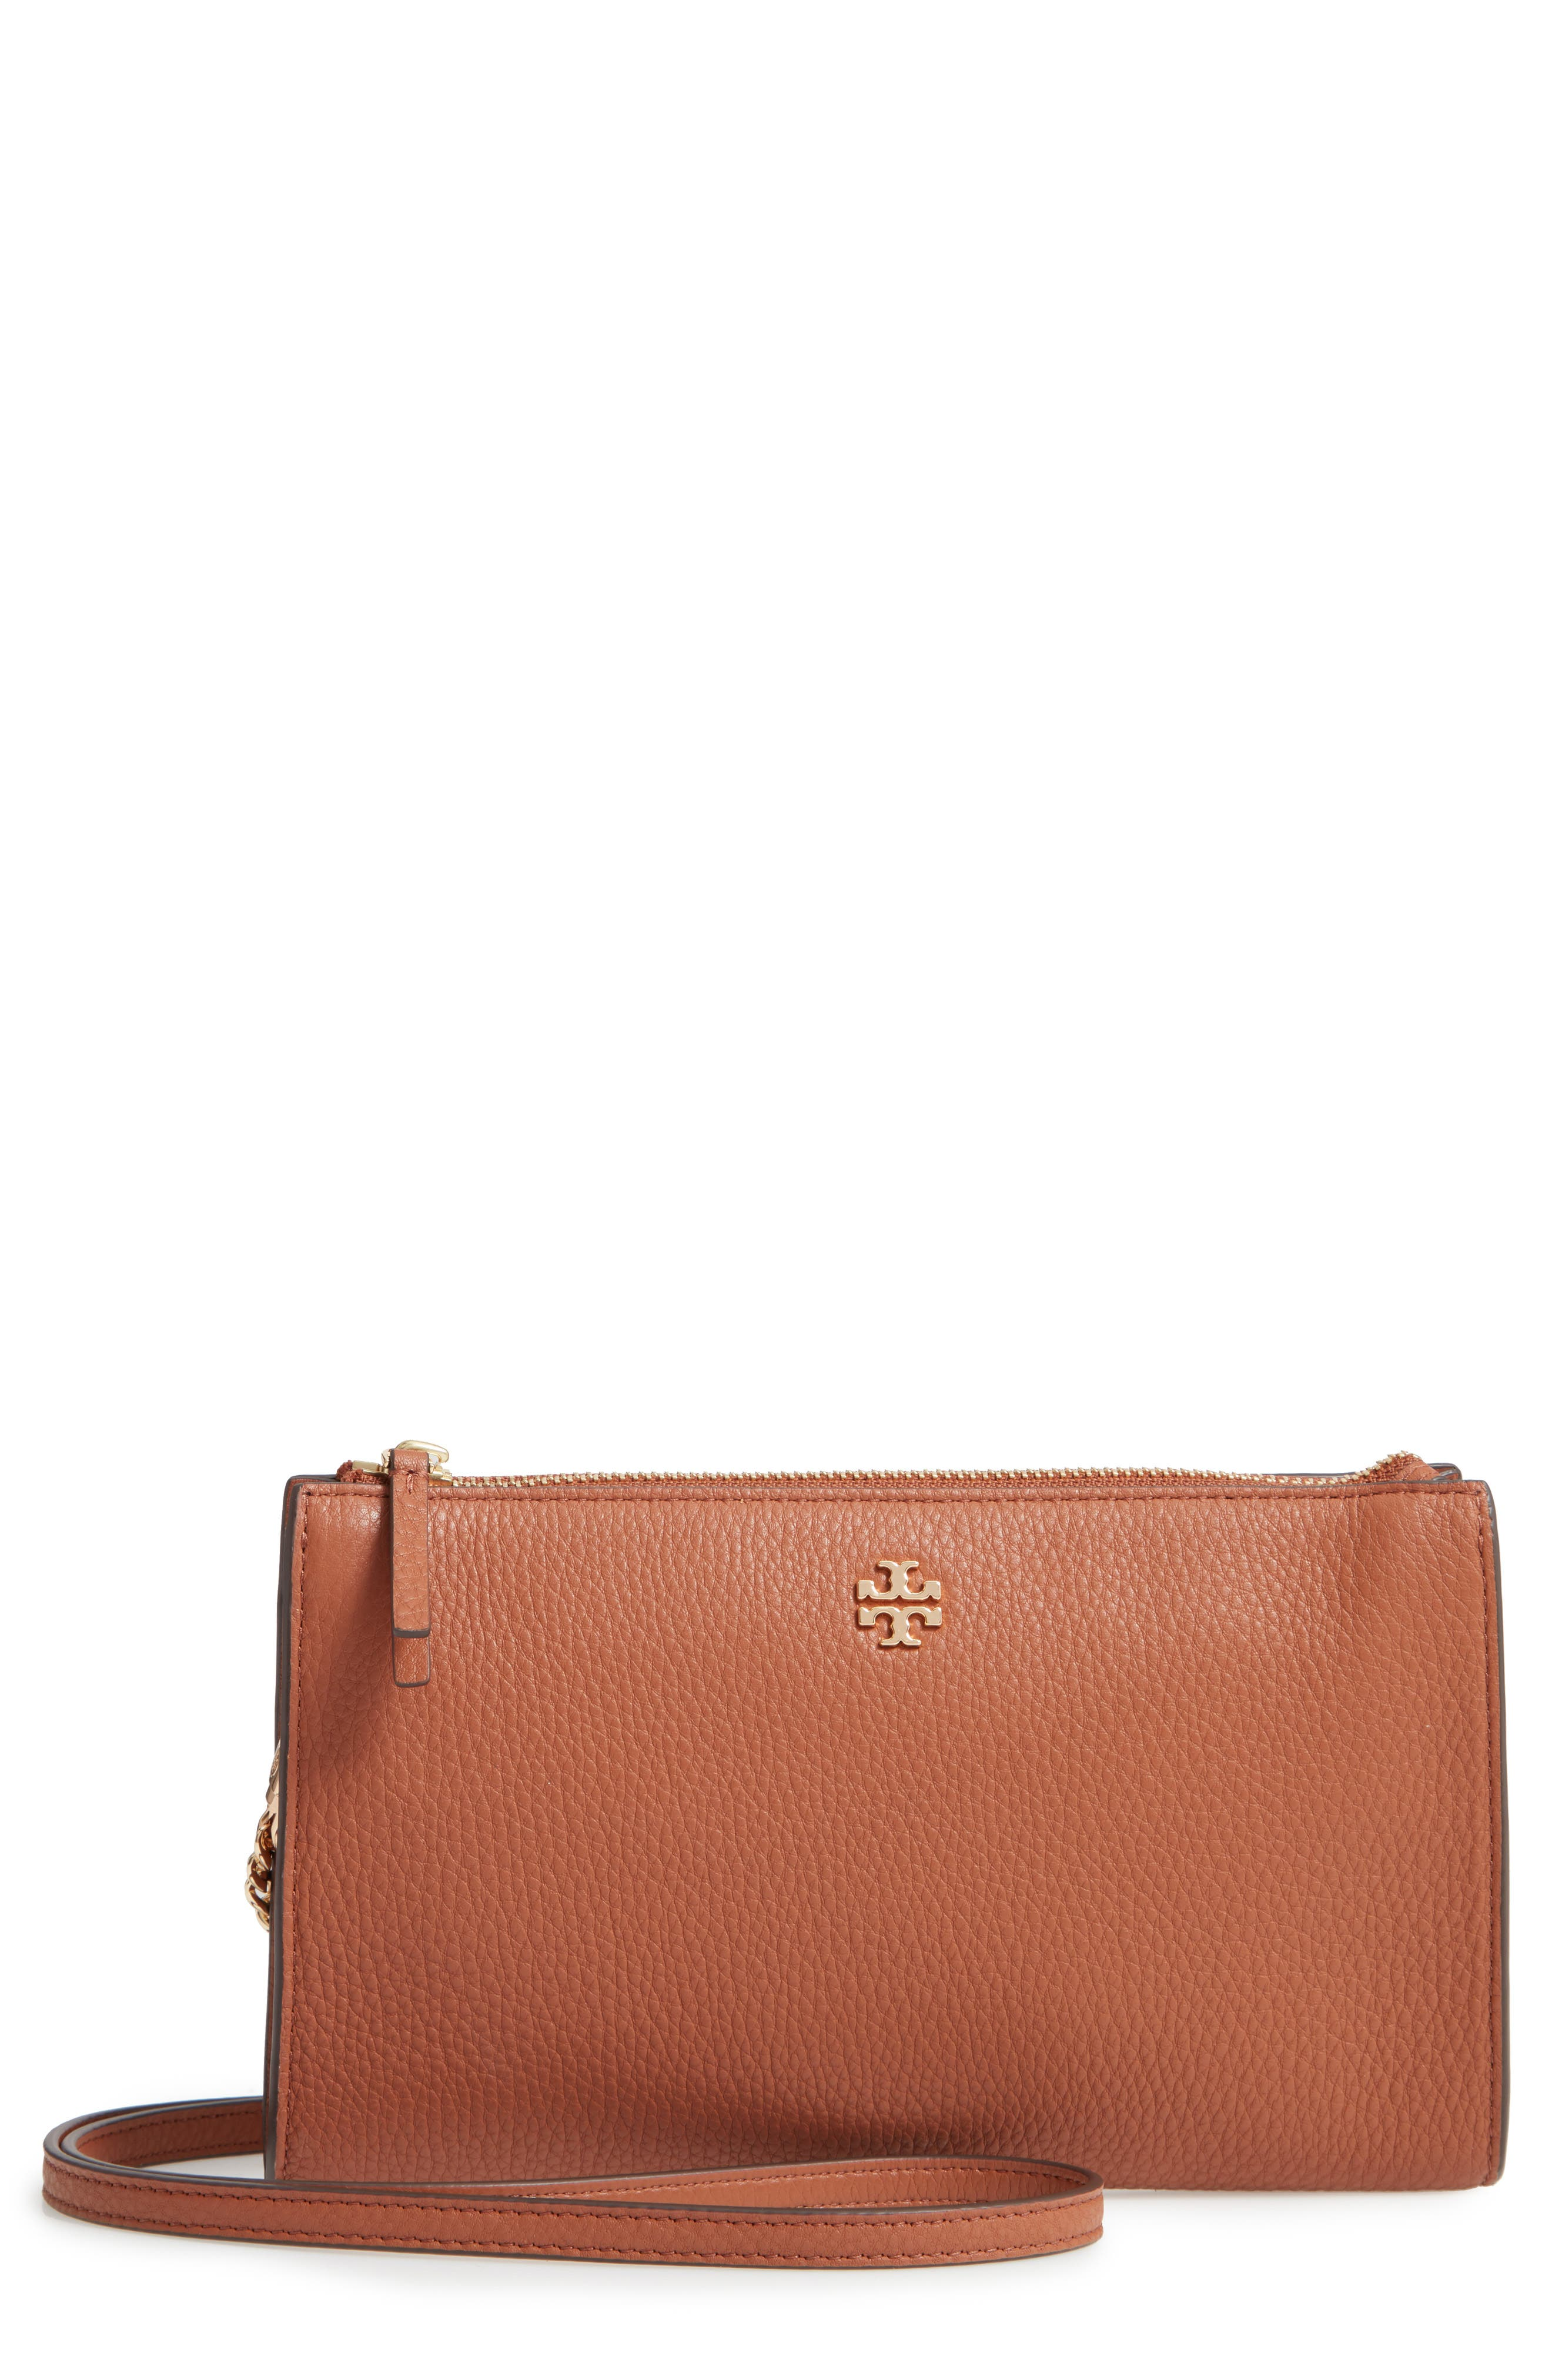 TORY BURCH,                             Pebbled Leather Top Zip Crossbody Bag,                             Main thumbnail 1, color,                             CLASSIC TAN